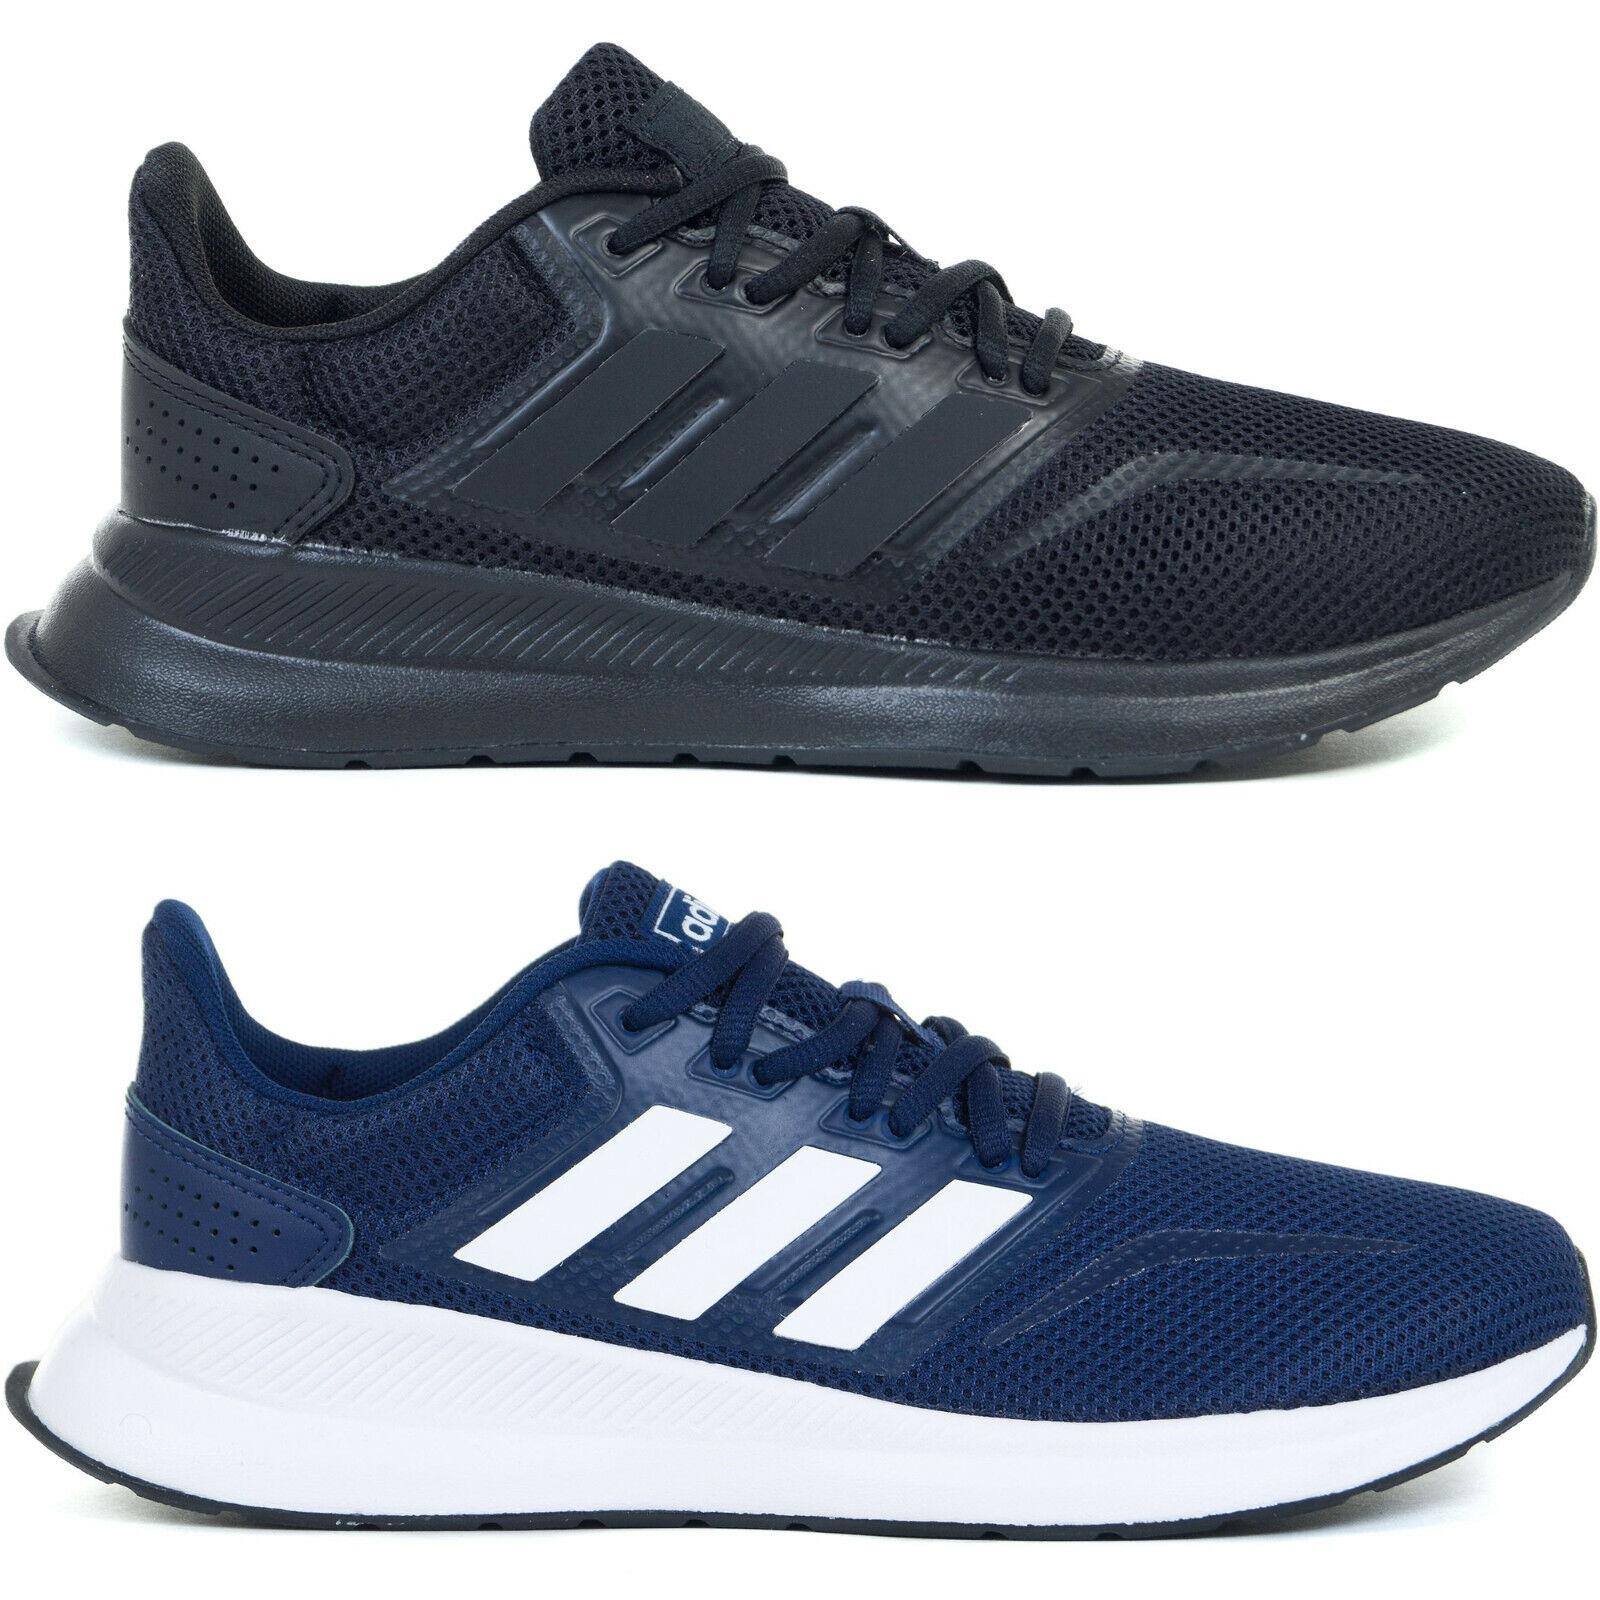 Running Training Gym Shoes Mesh